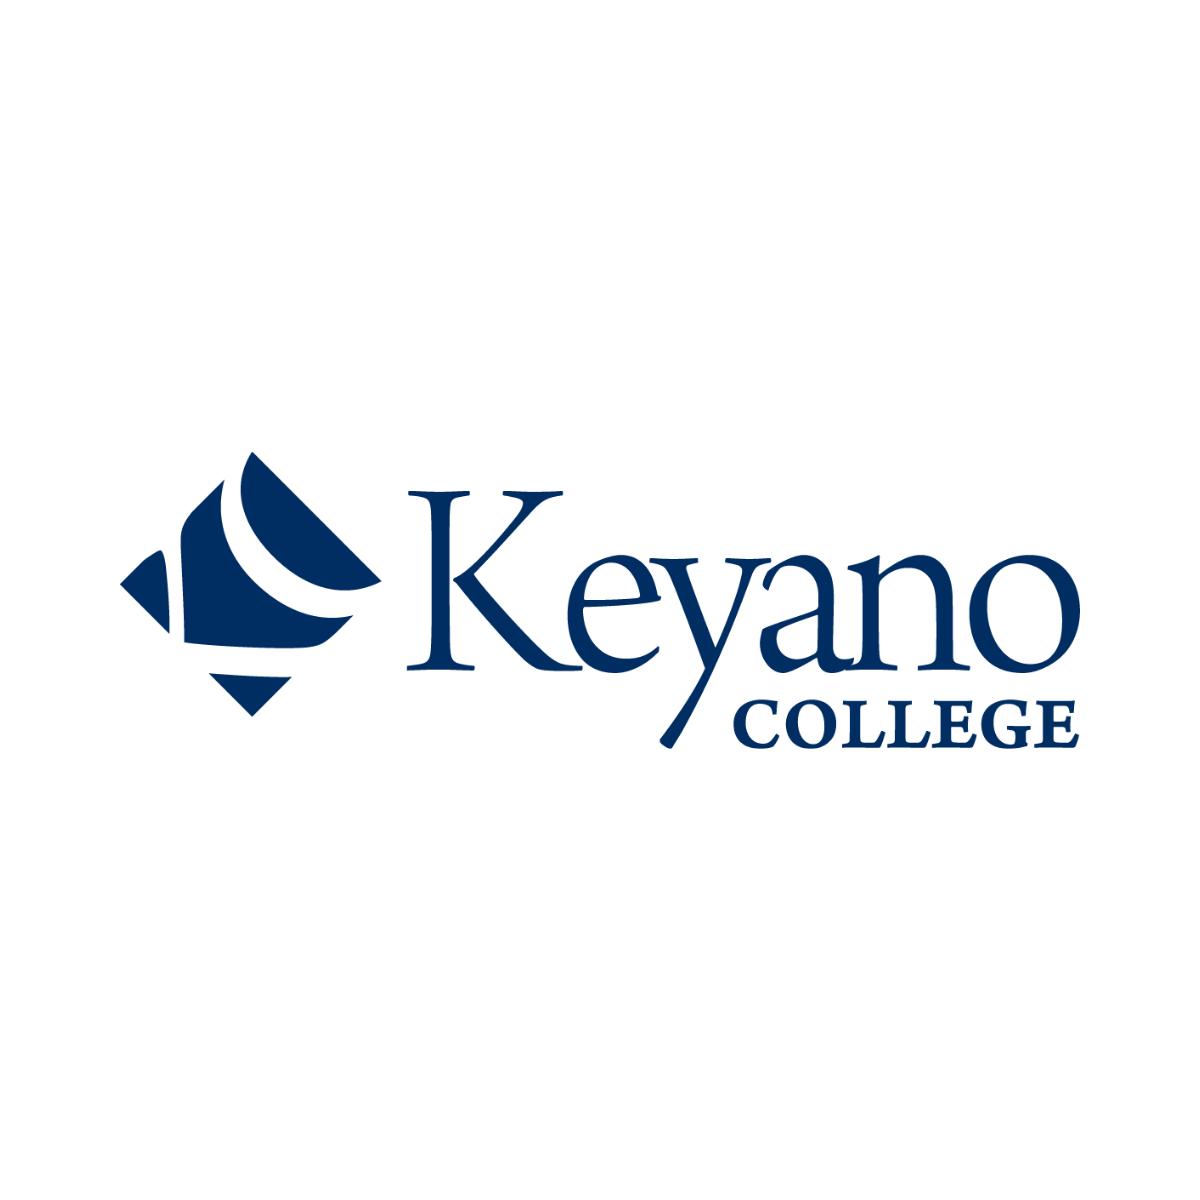 Keyano College Logo Image